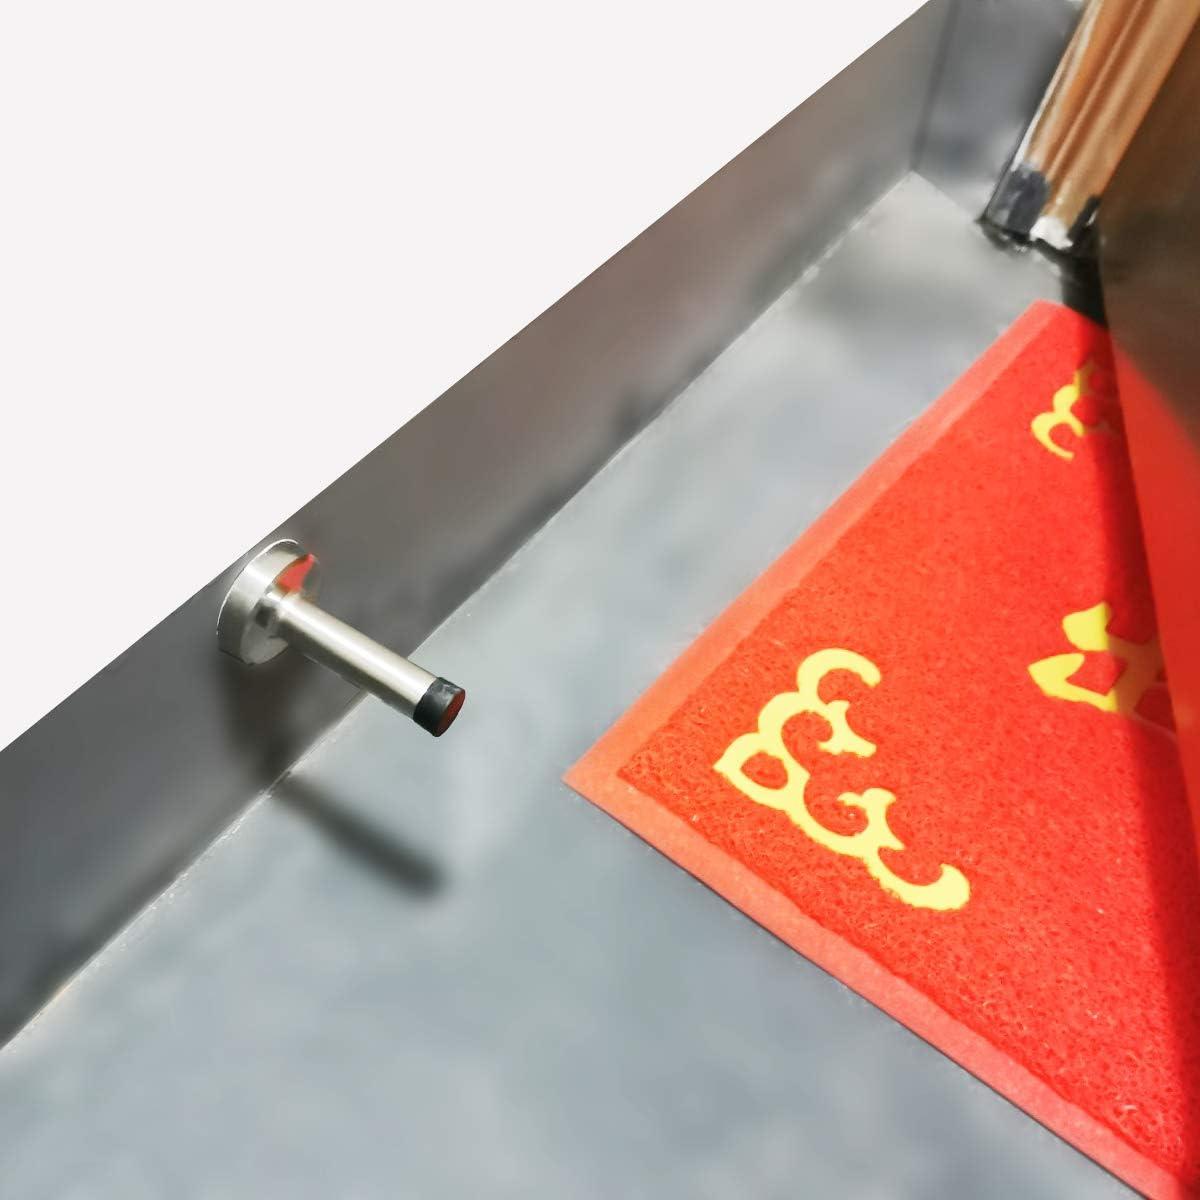 Tope de puerta autoadhesivo de acero inoxidable tope de puerta largo con absorci/ón ac/ústica